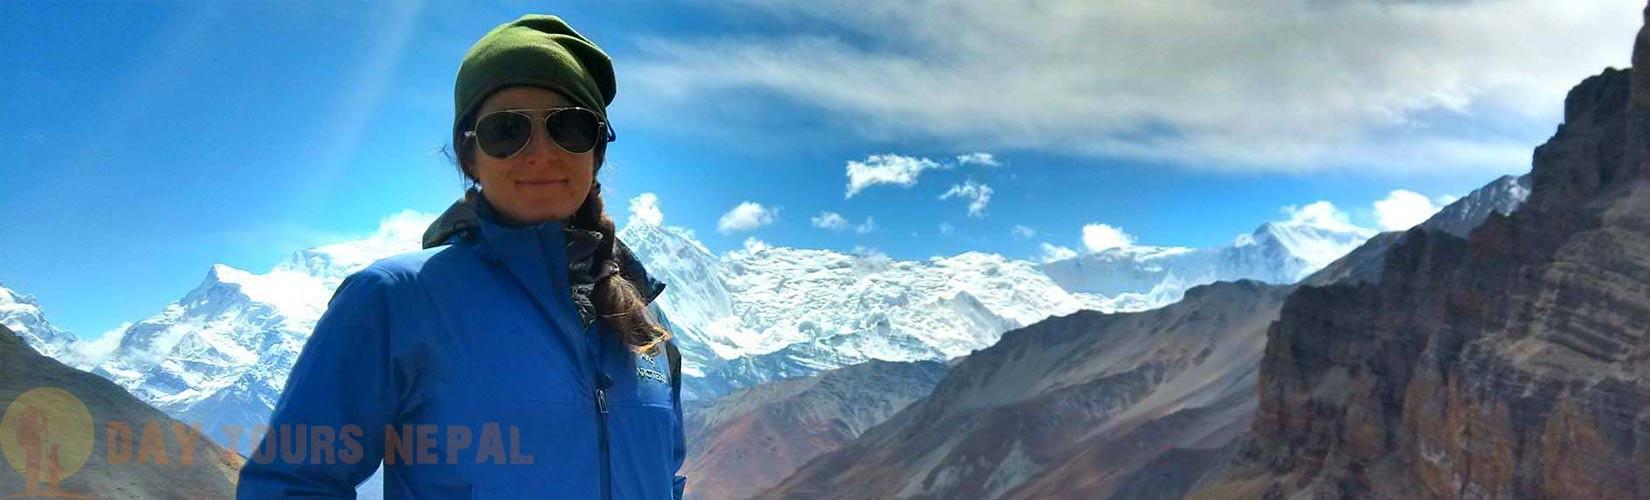 thorong la pass trek annapurna Day Tours Nepal